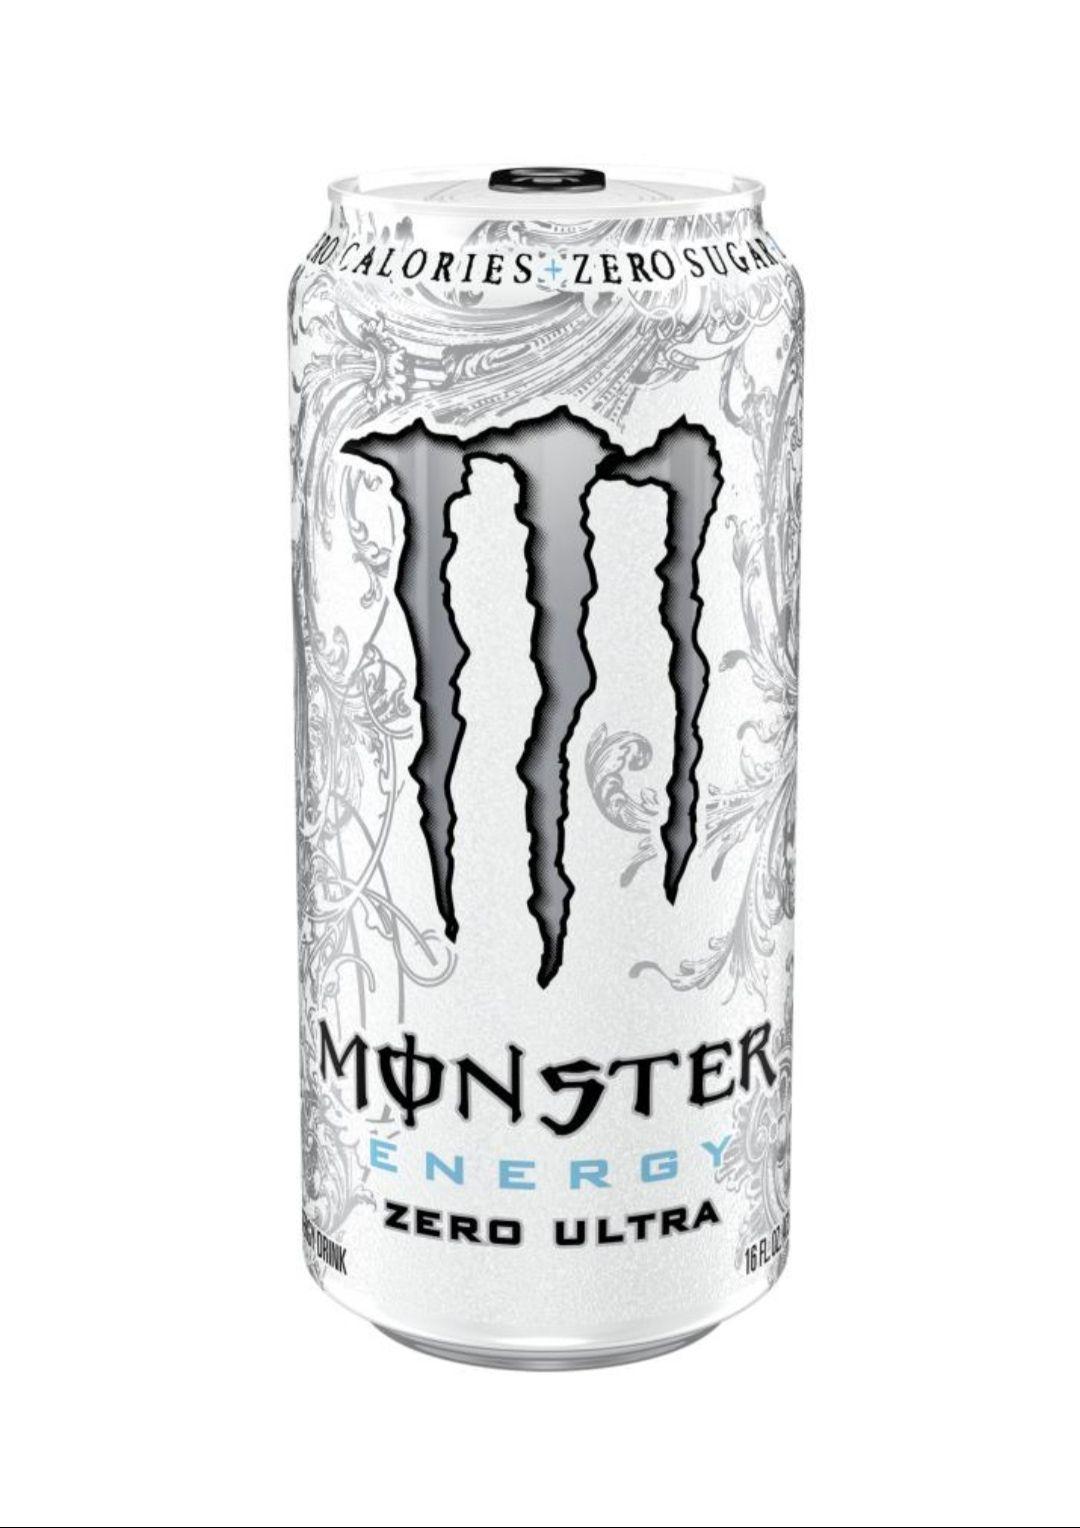 Monster Energy Zero - POLSKIKOSZYK.PL